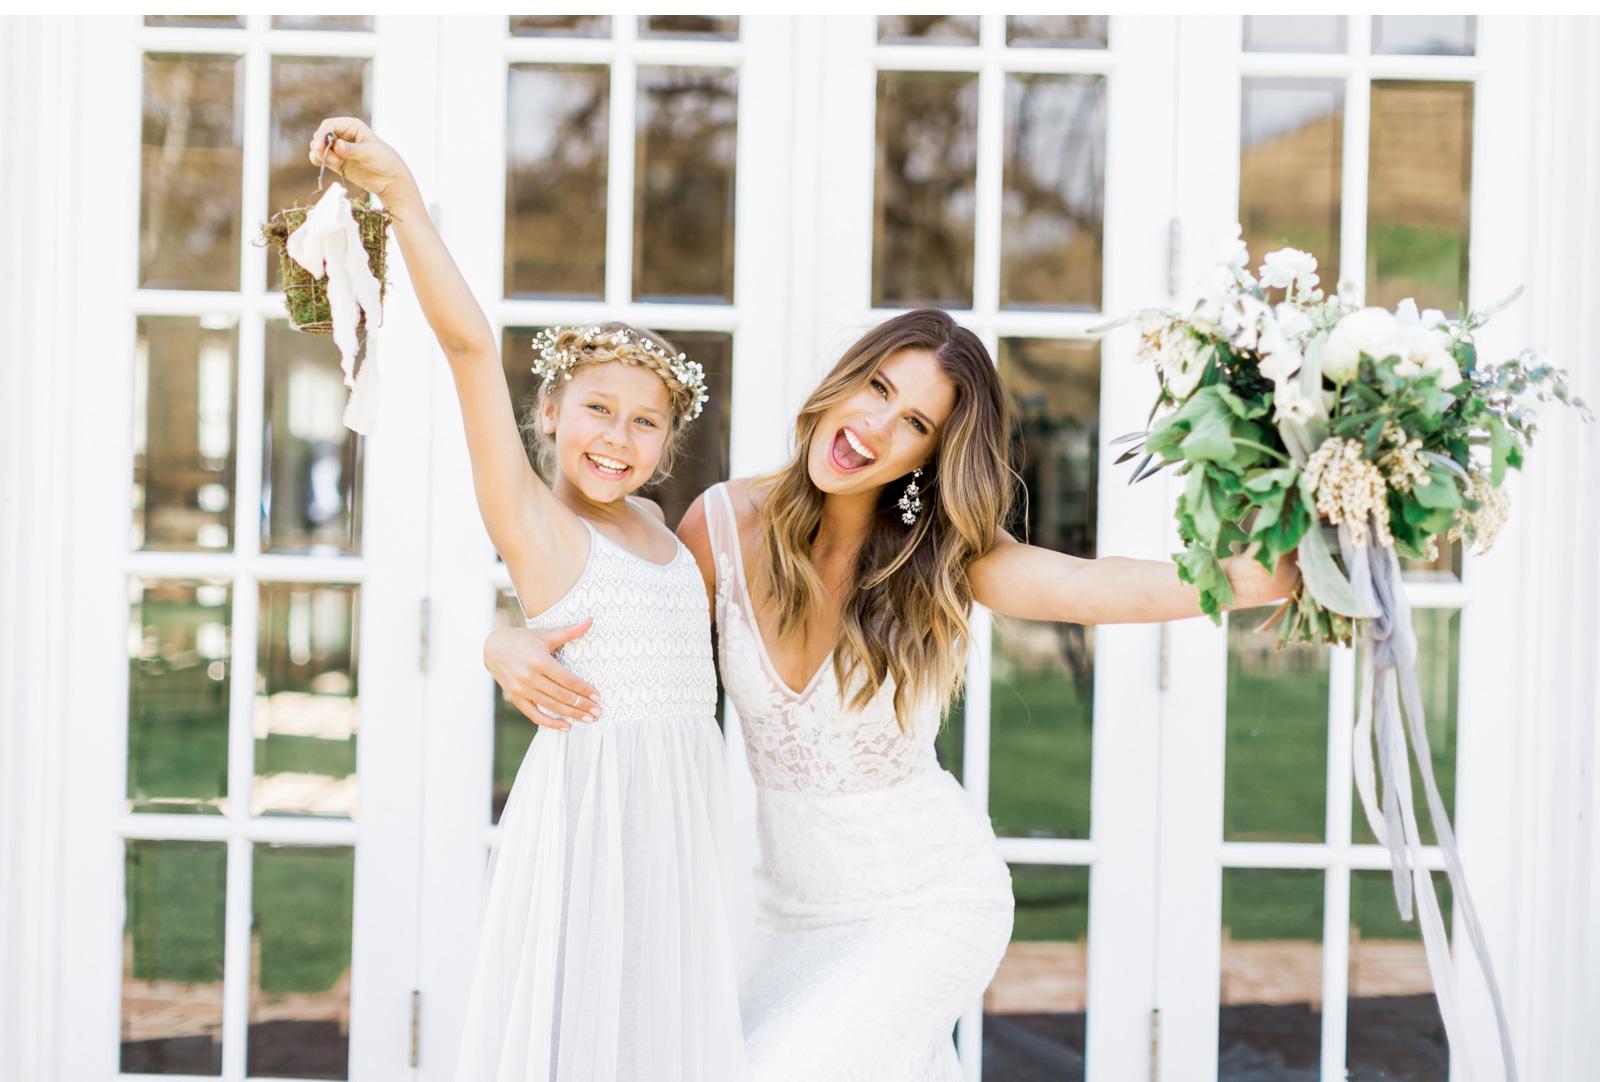 Malibu-Wedding-Photographer-Saddlerock-Ranch-Triunfo-Creek-Style-Me-Pretty_05.jpg